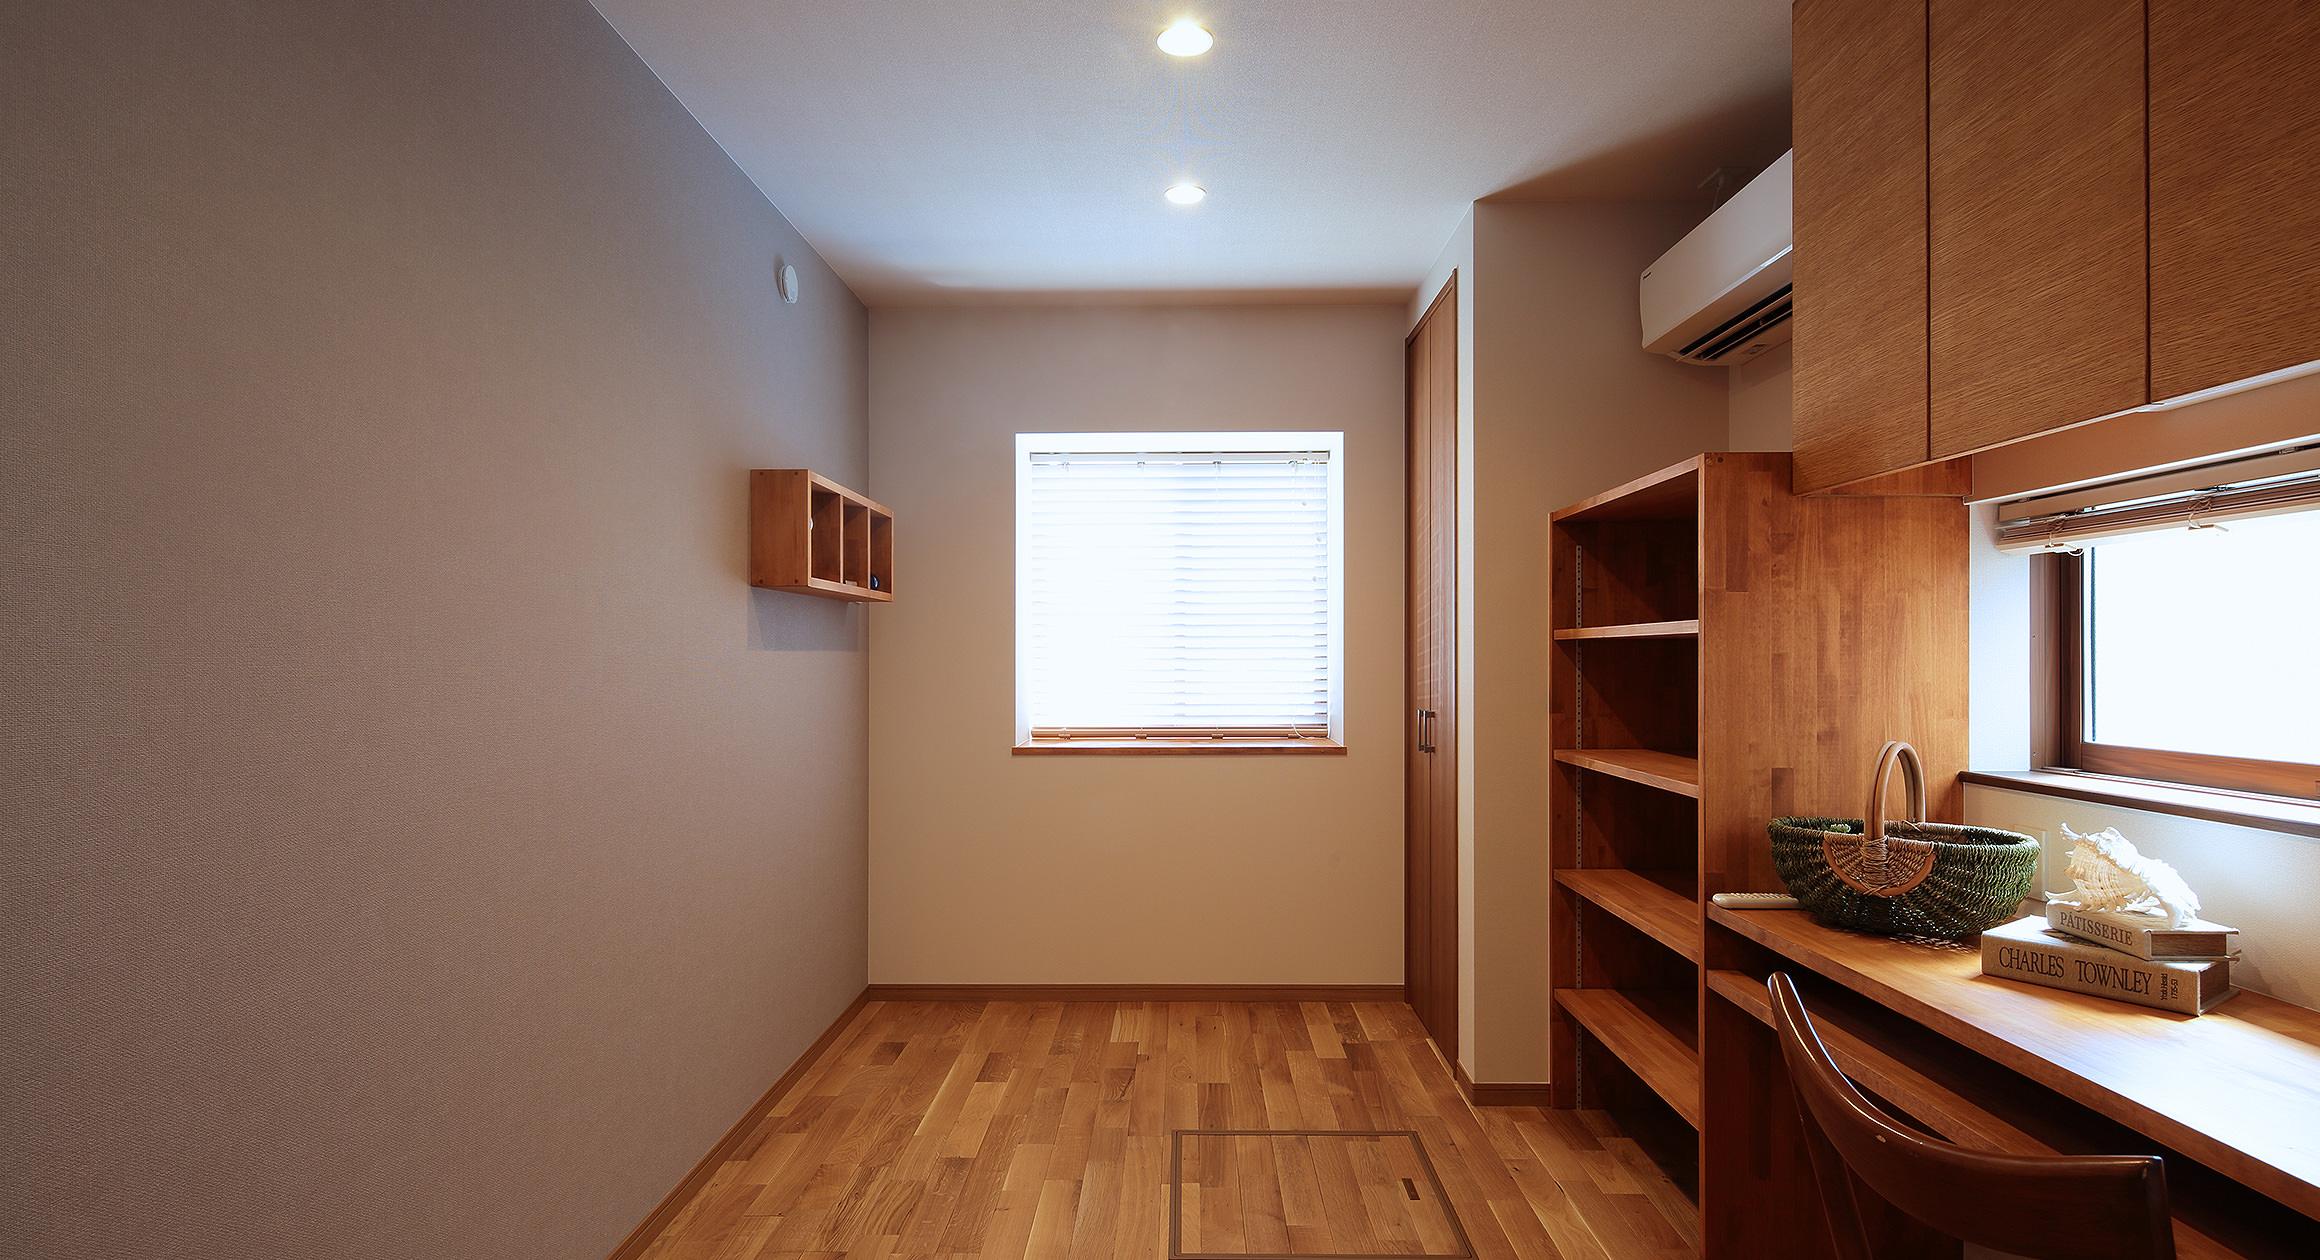 三友工務店の新築注文住宅 熊本市M様邸